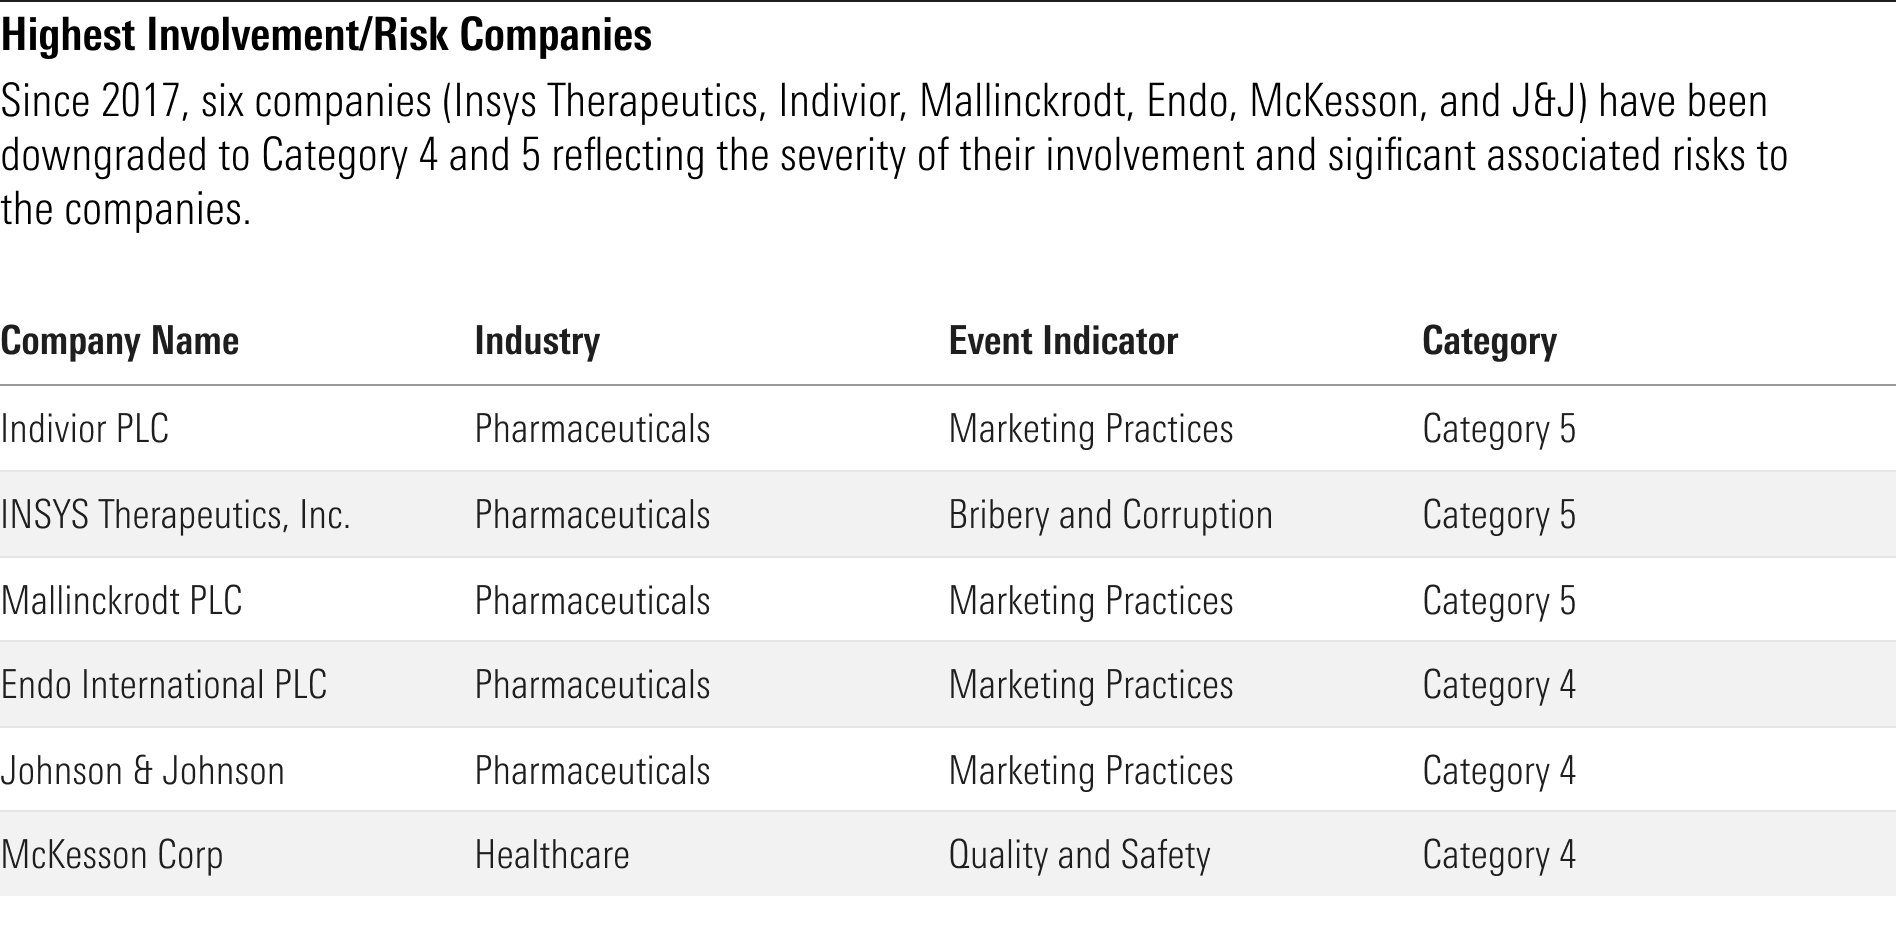 Highest Involvement/Risk Companies